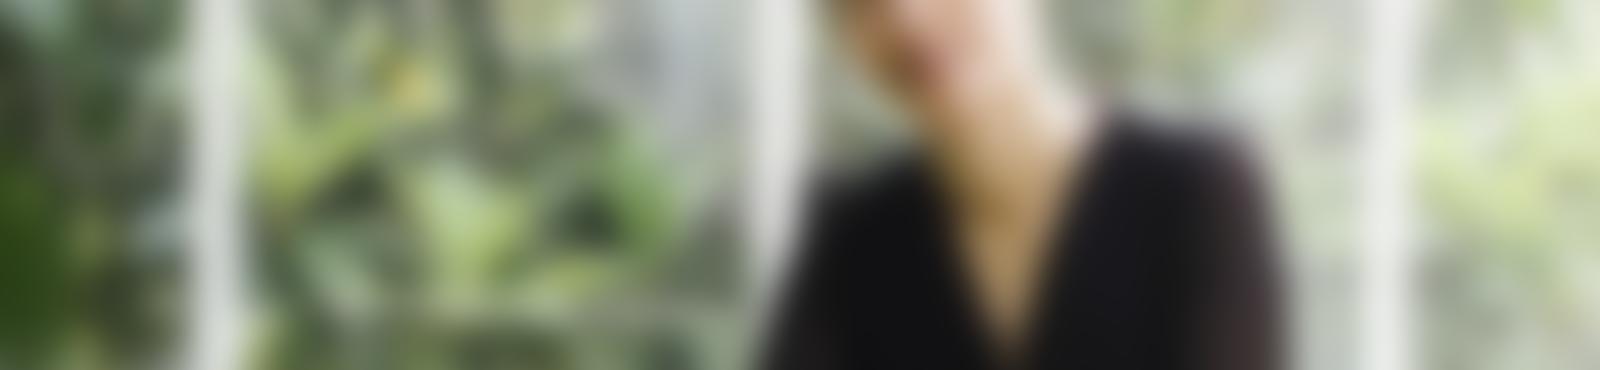 Blurred 3b543ece d802 4f04 ad35 b3b7600e450e